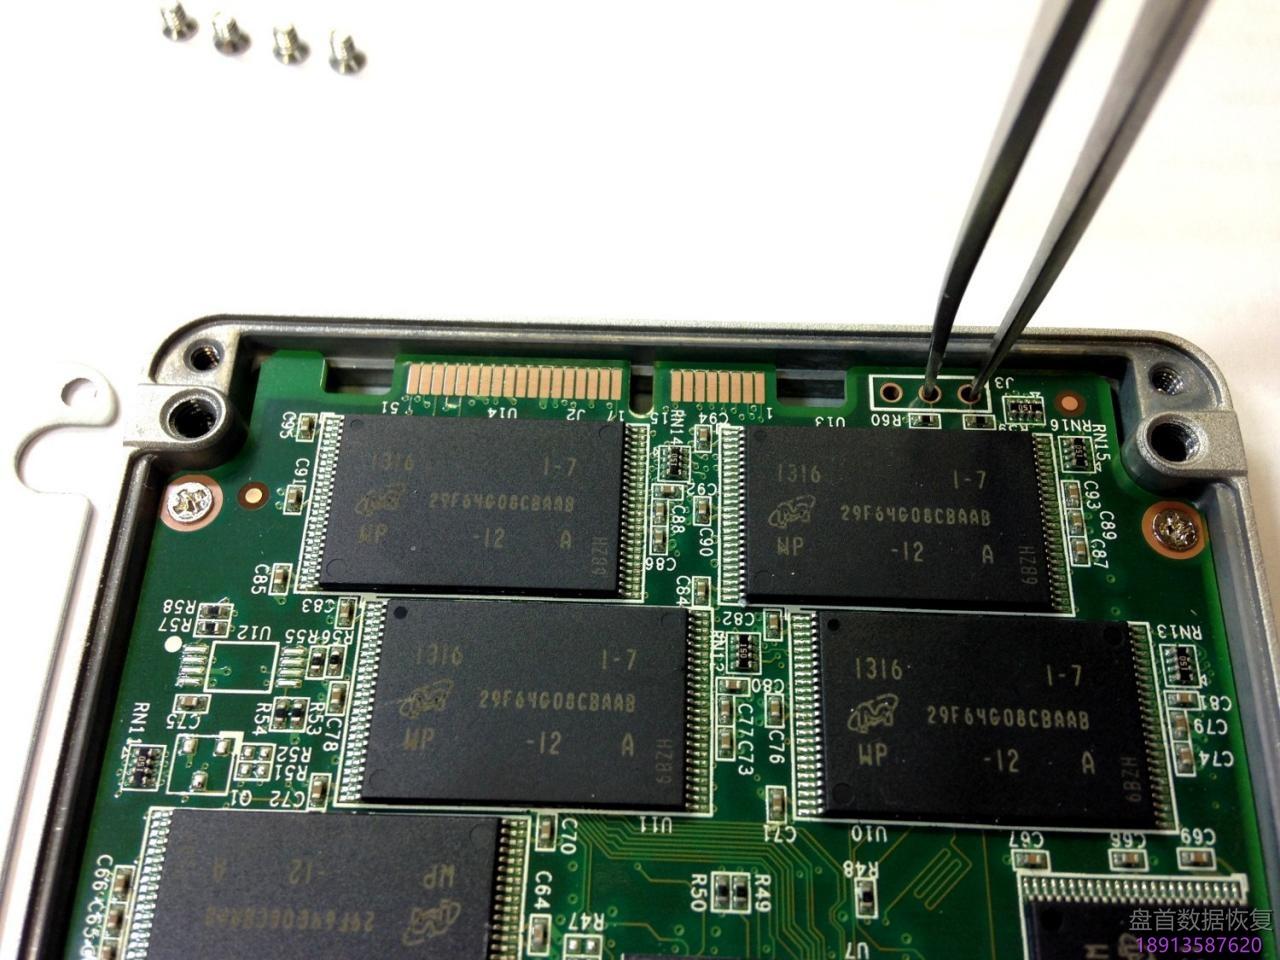 pc-3000-ssd饥饿鲨oczbarefoot-3家族系列数据恢复全过程 PC-3000 SSD饥饿鲨OCZ(Barefoot 3)家族系列数据恢复全过程